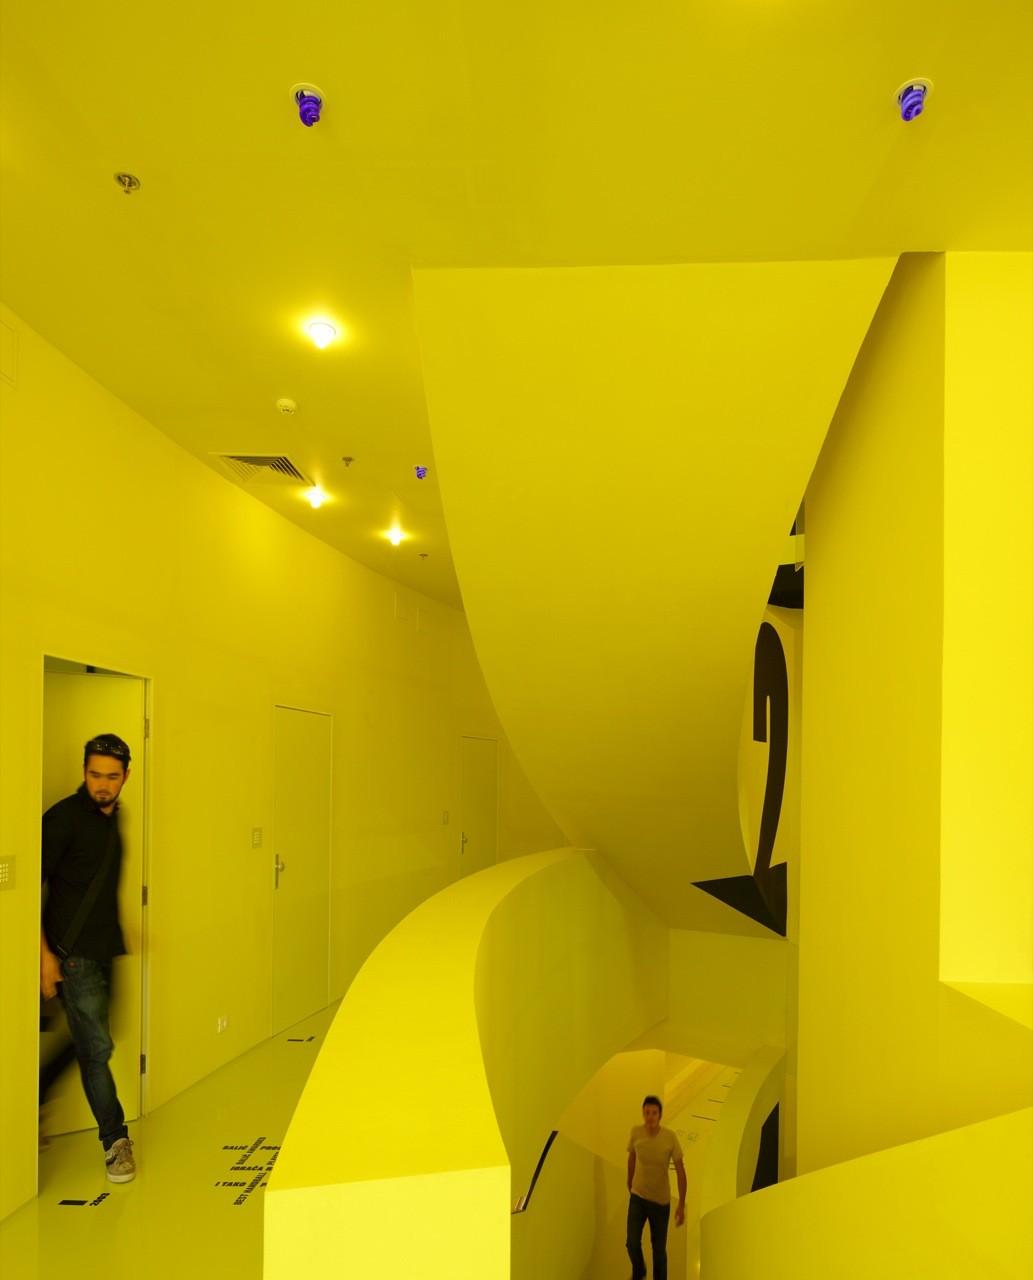 Hostel Golly±Bossy / Studio Up, © Robert Leš